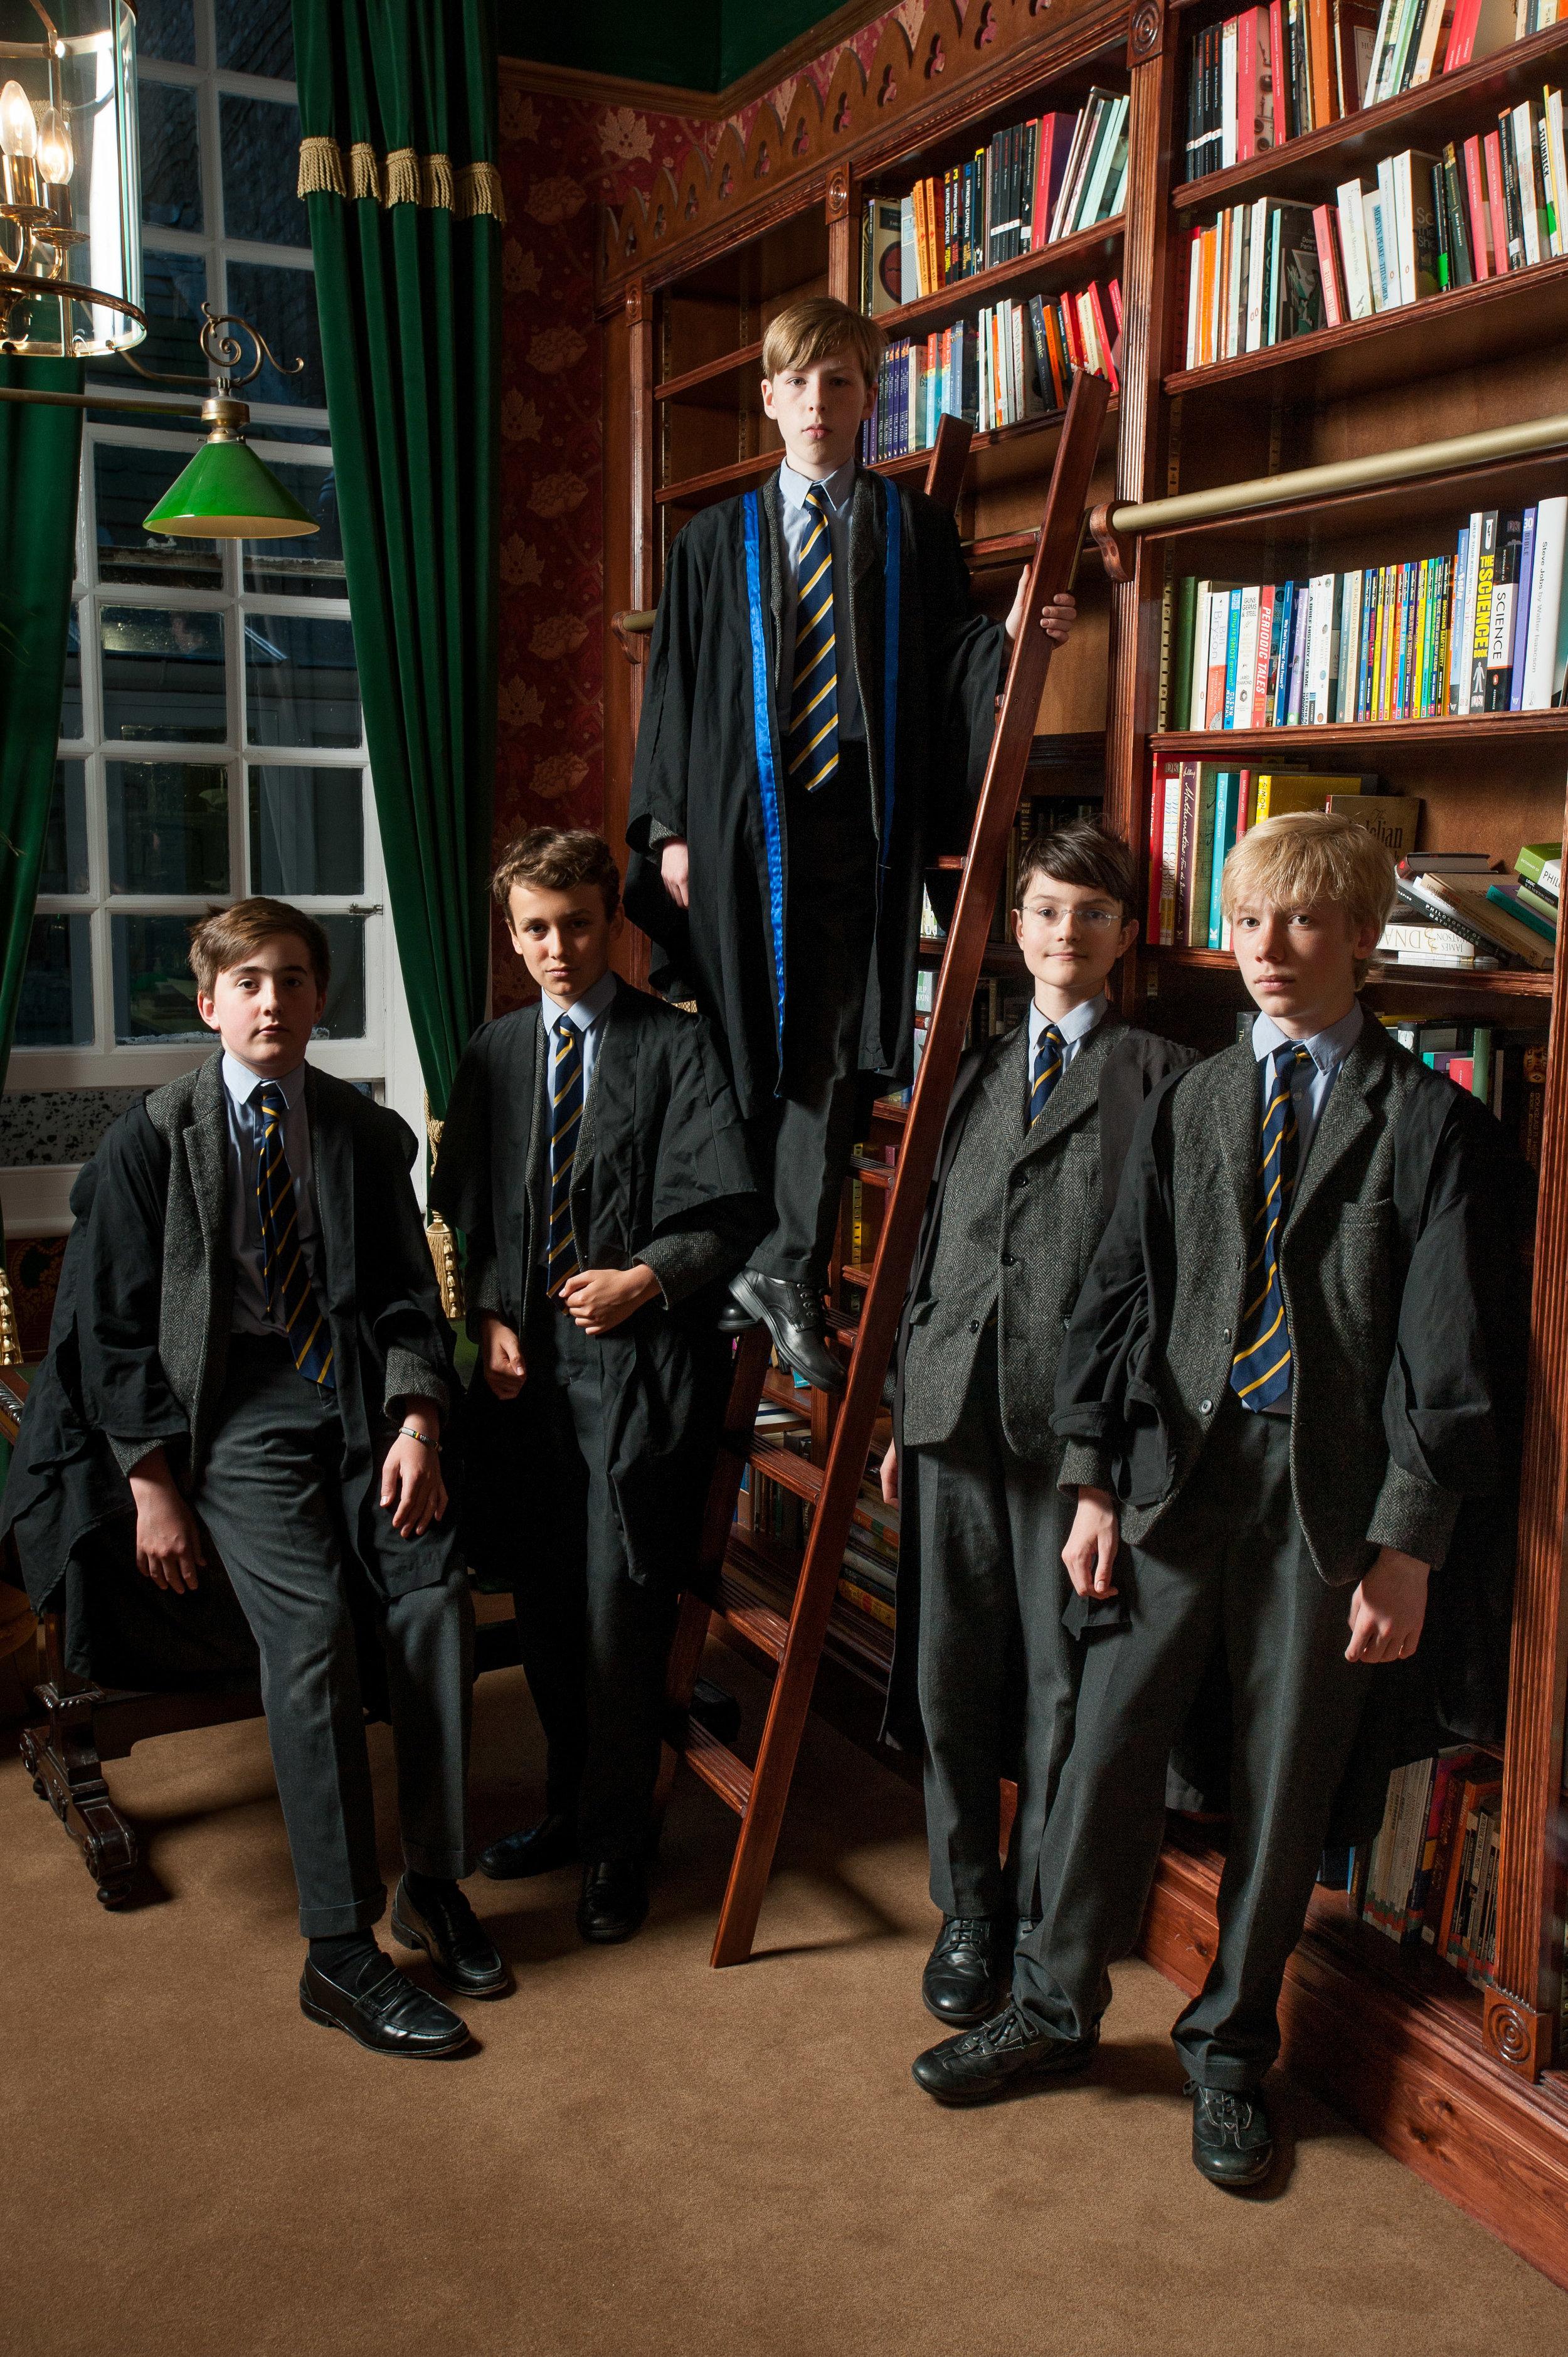 Sussex House School